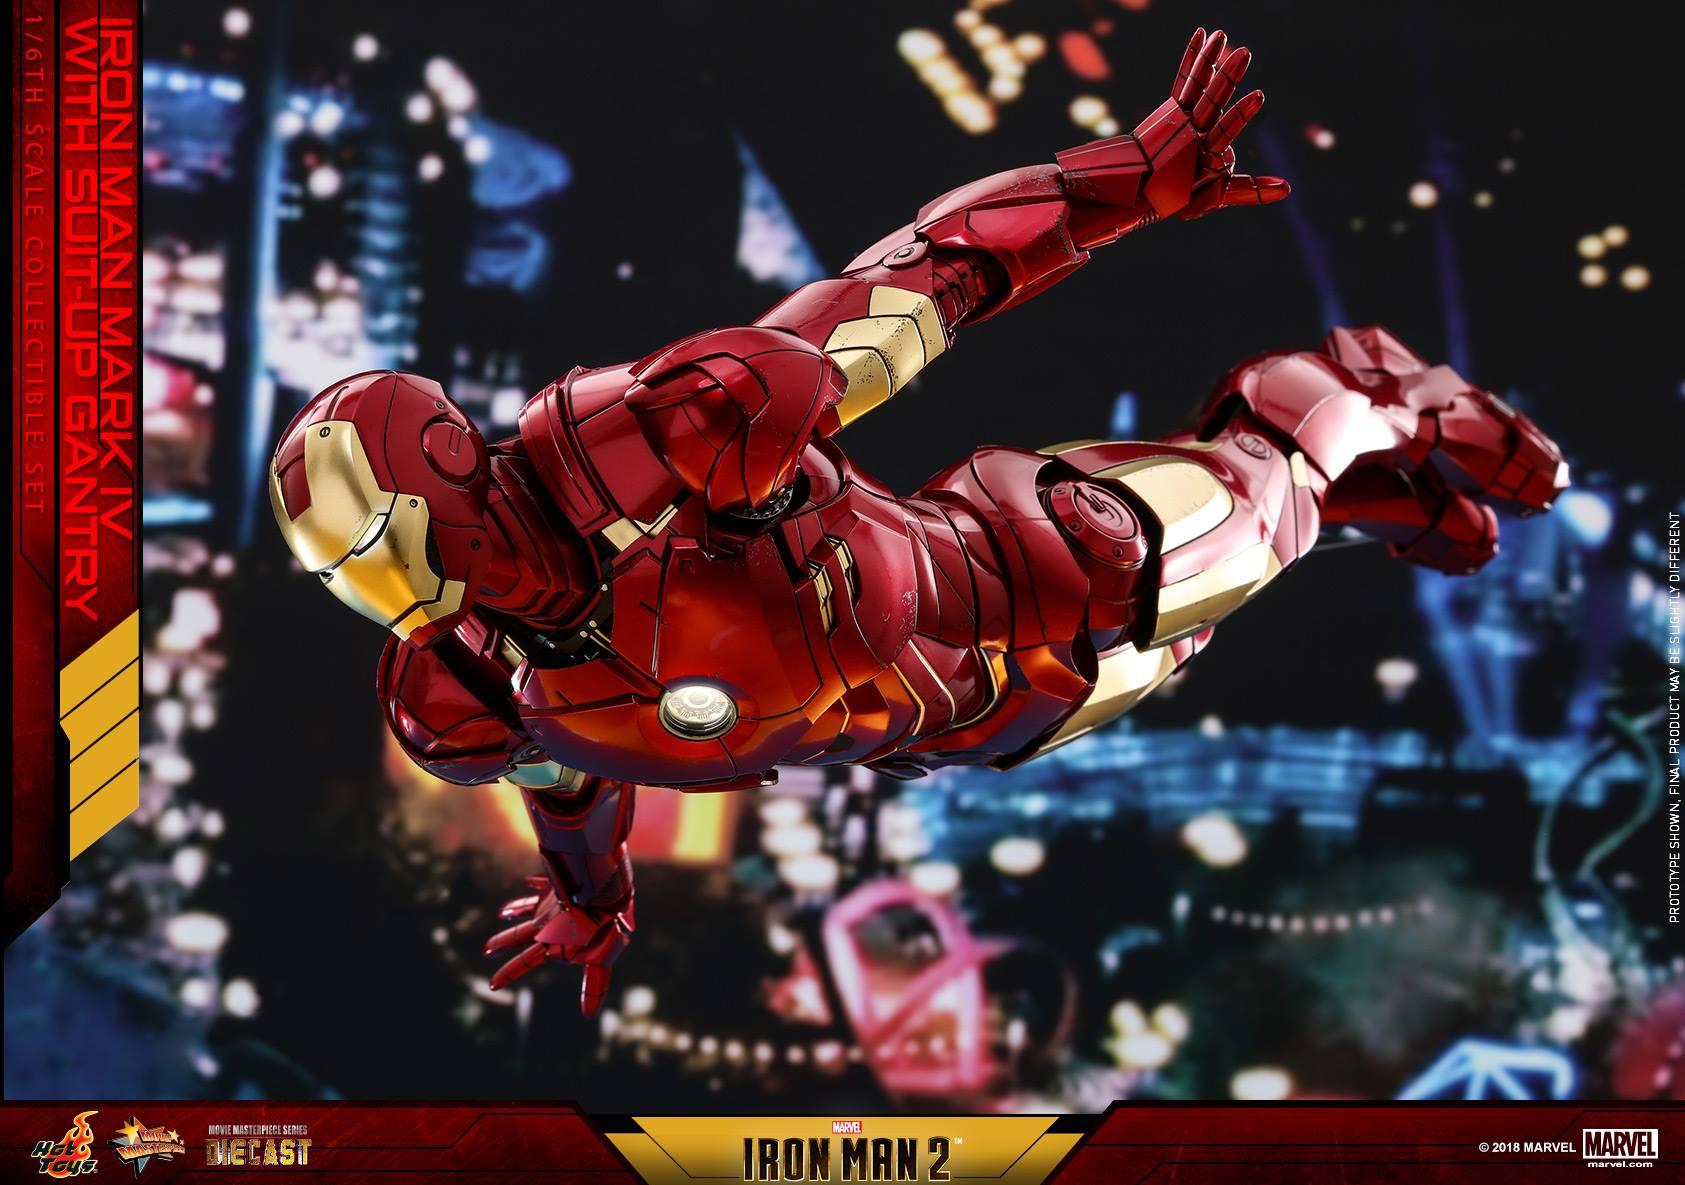 Hot-Toys-Iron-Man-MKIV-with-Gantry-011